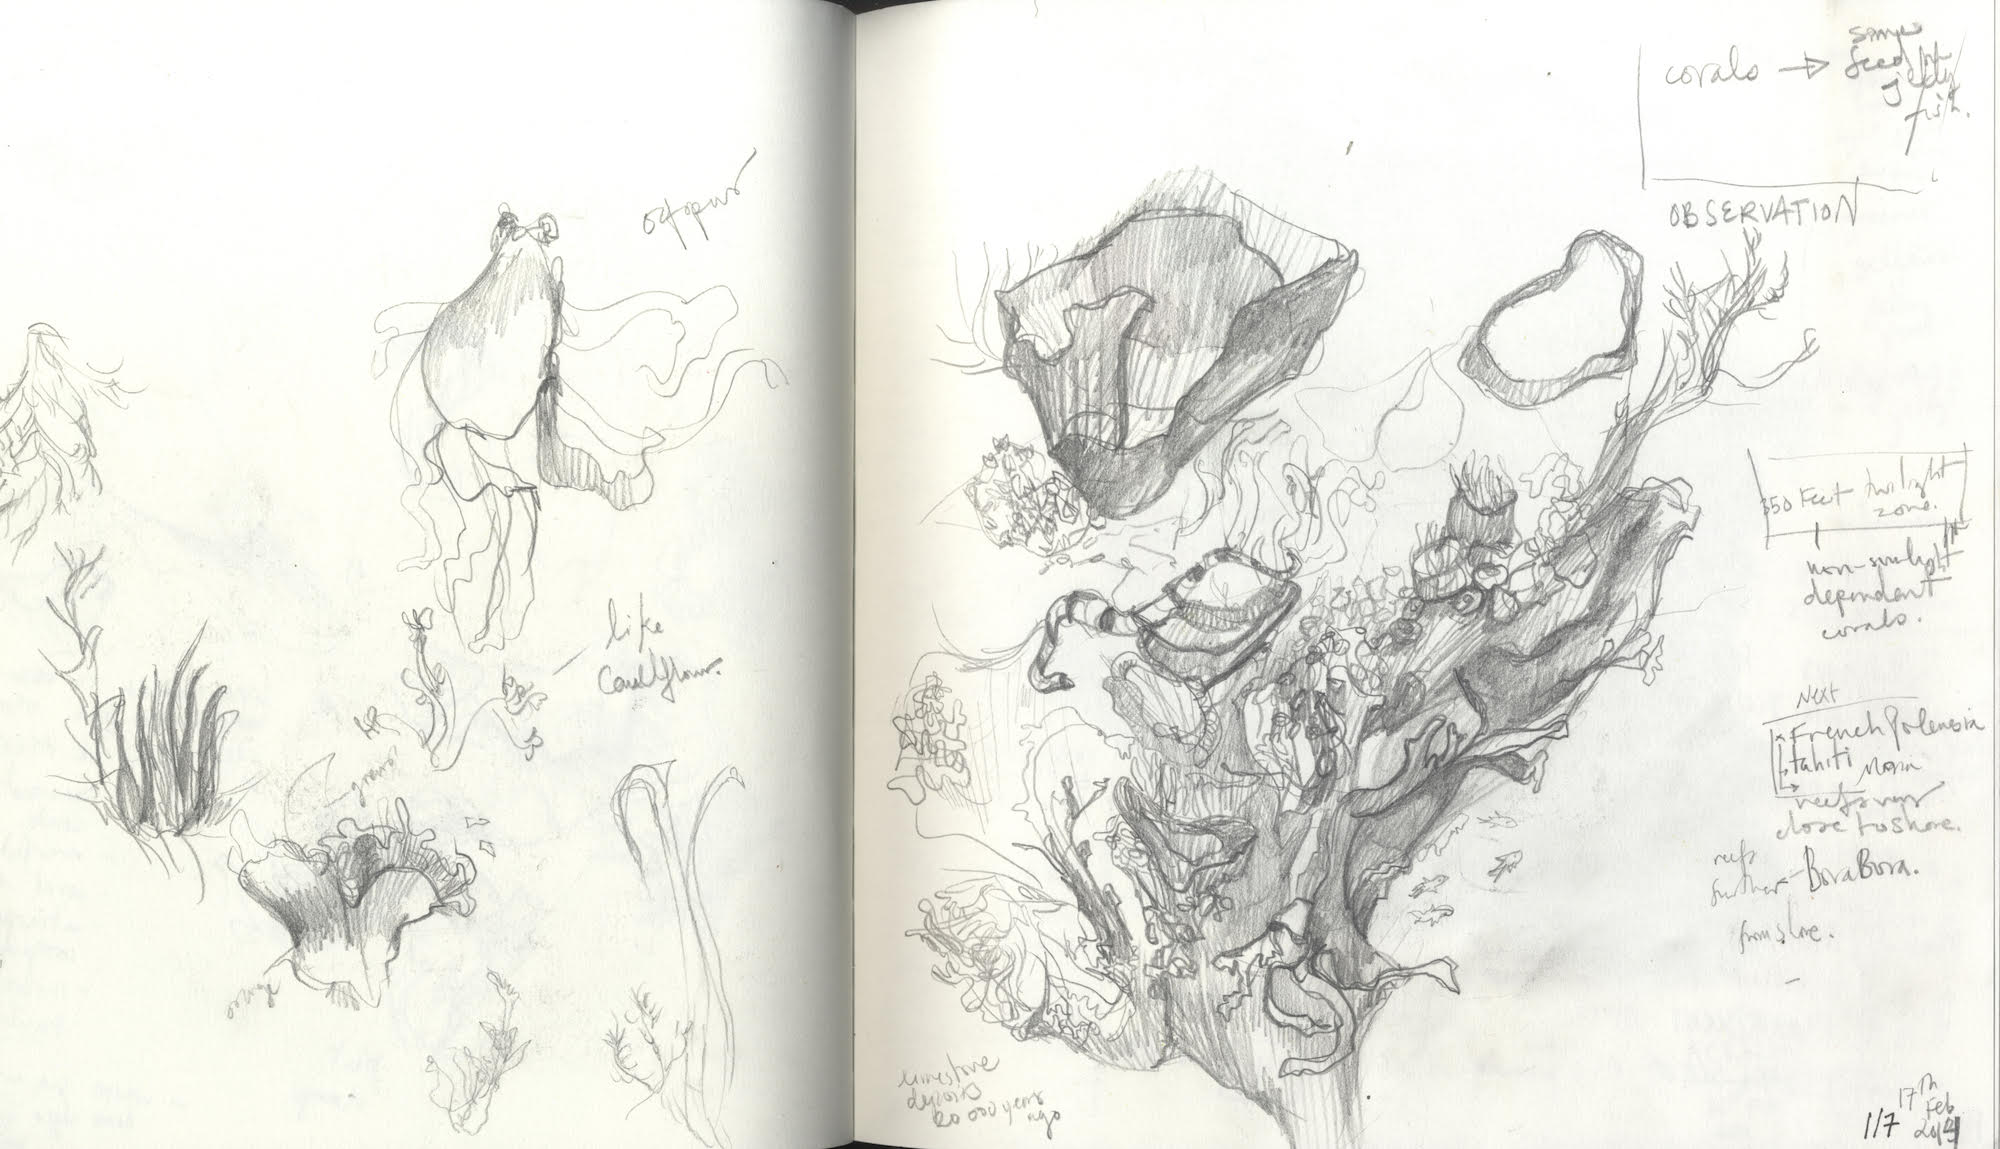 Yasmine Al Nabulsi's sketchbook